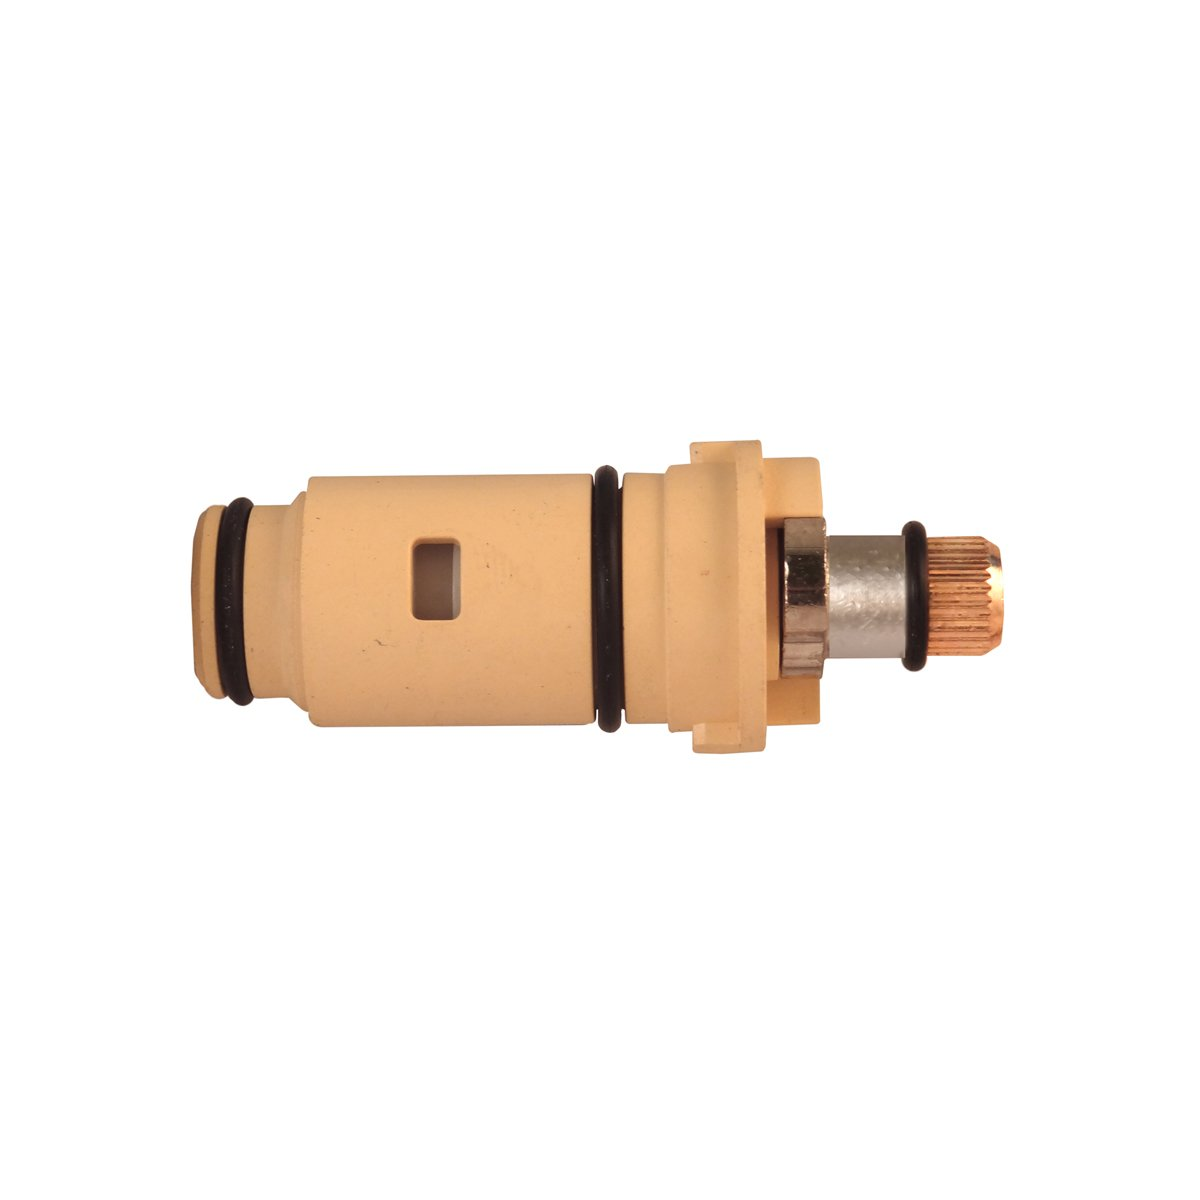 Danco 17251B 5L-7H Hot Stem for Wolverine Faucets